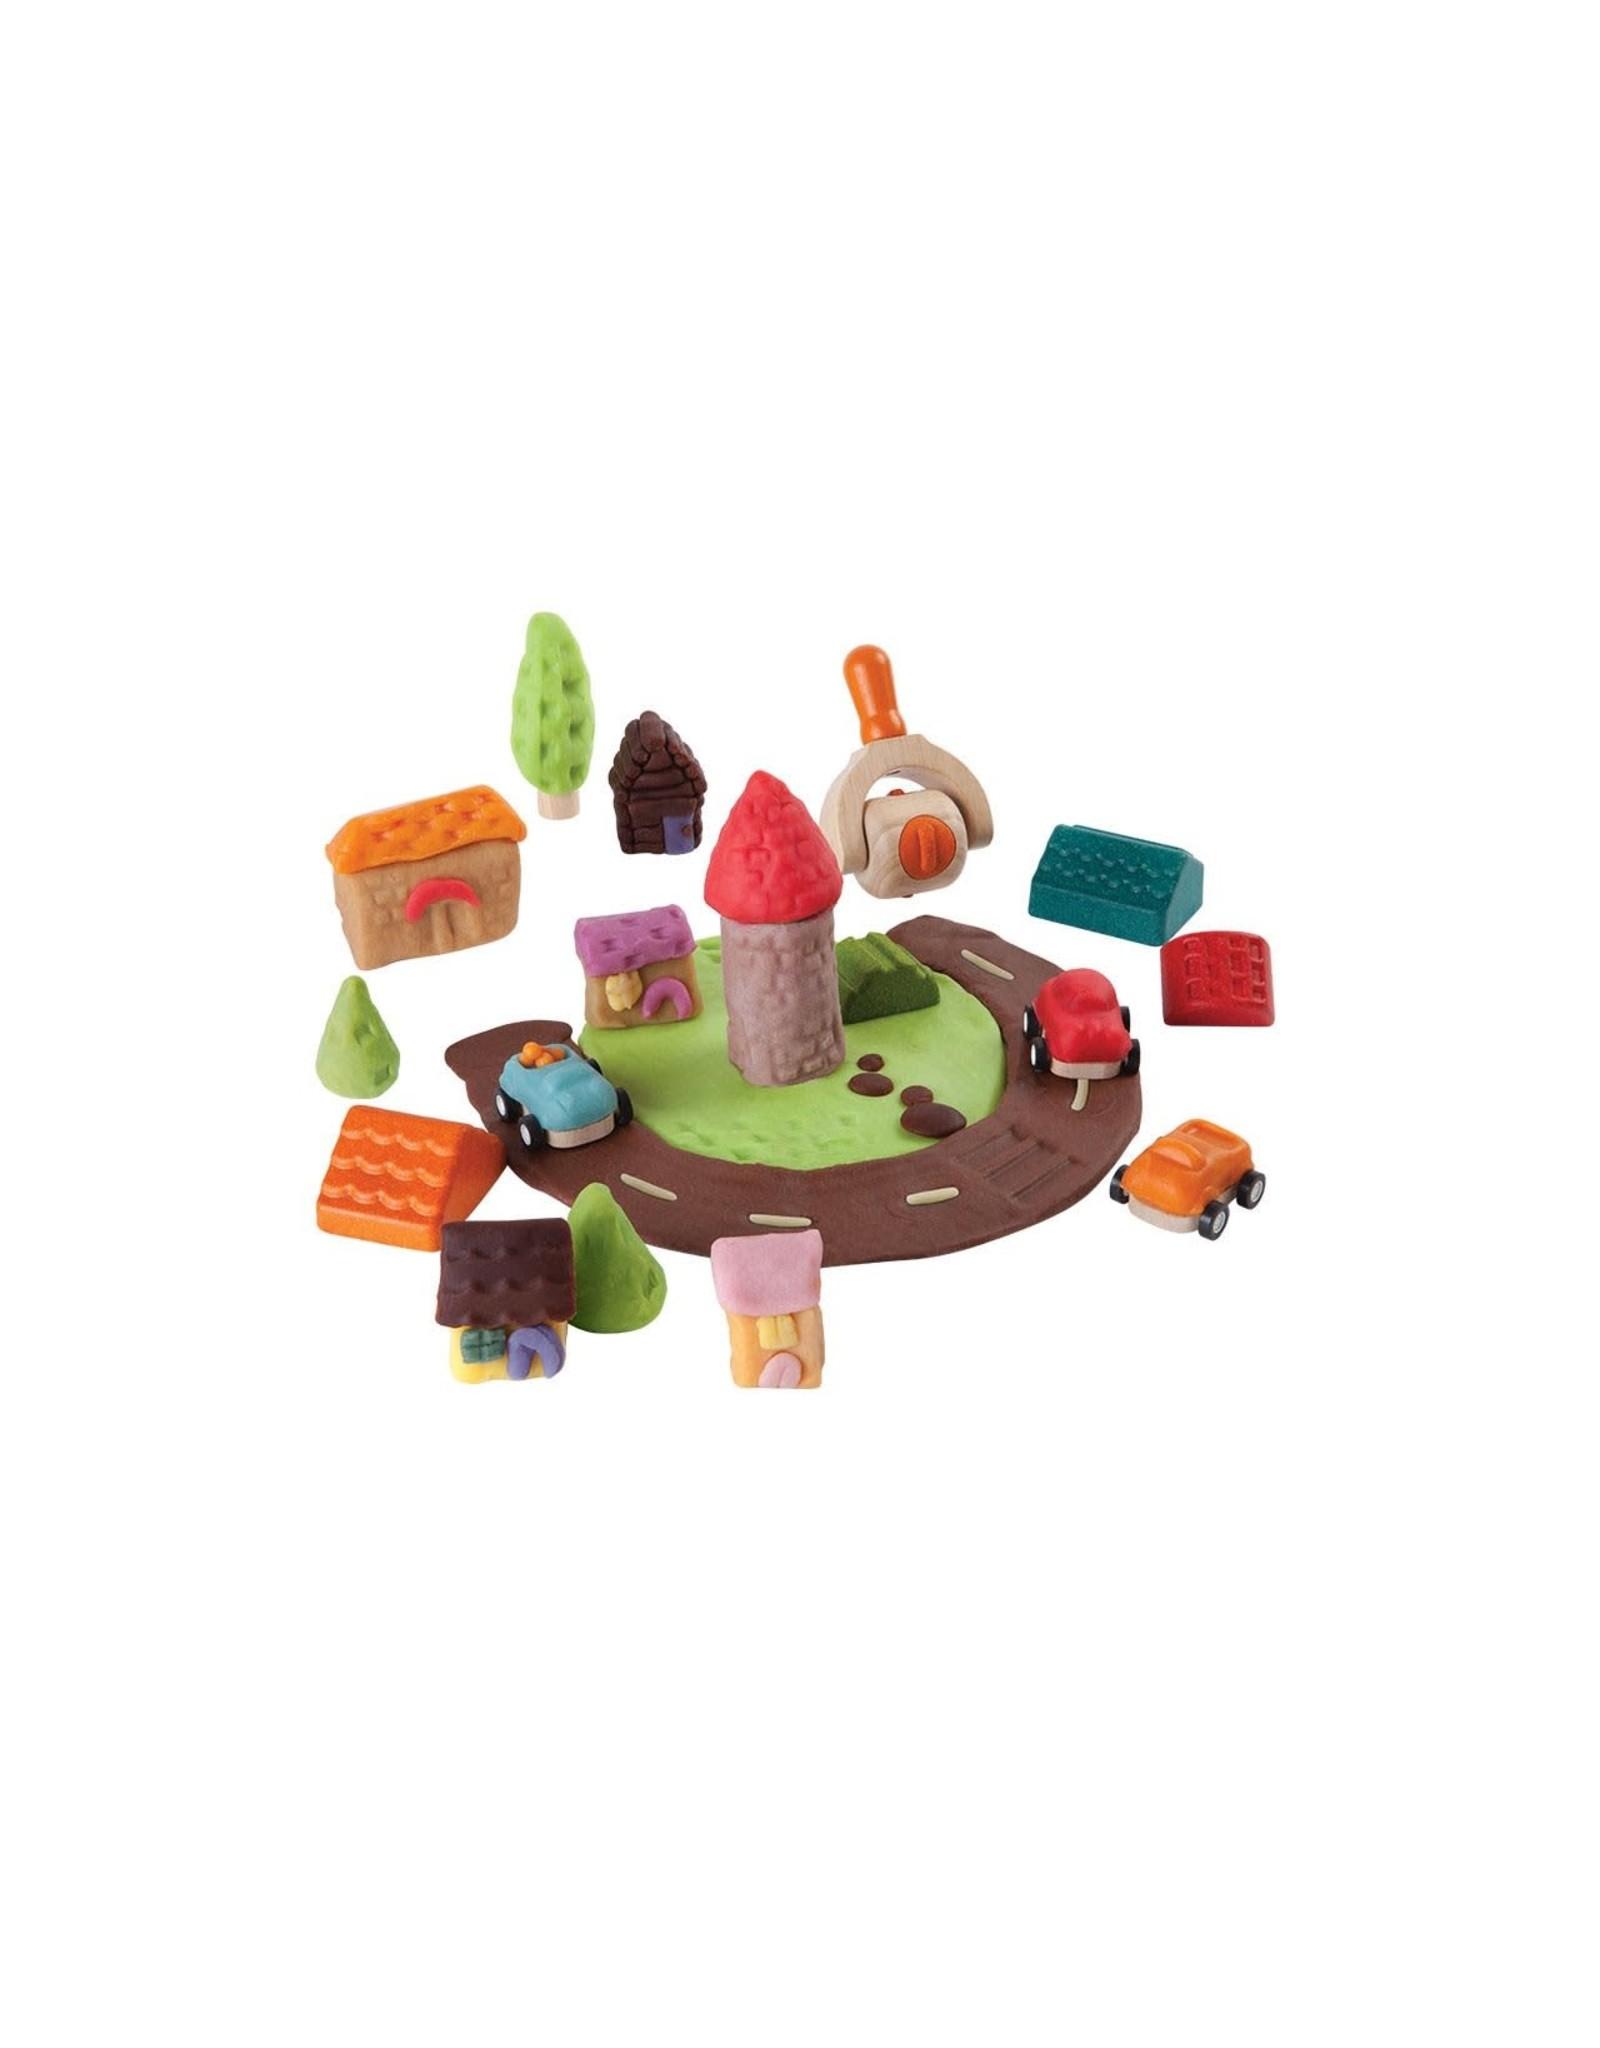 Plan Toys Build-A-Town Dough Set